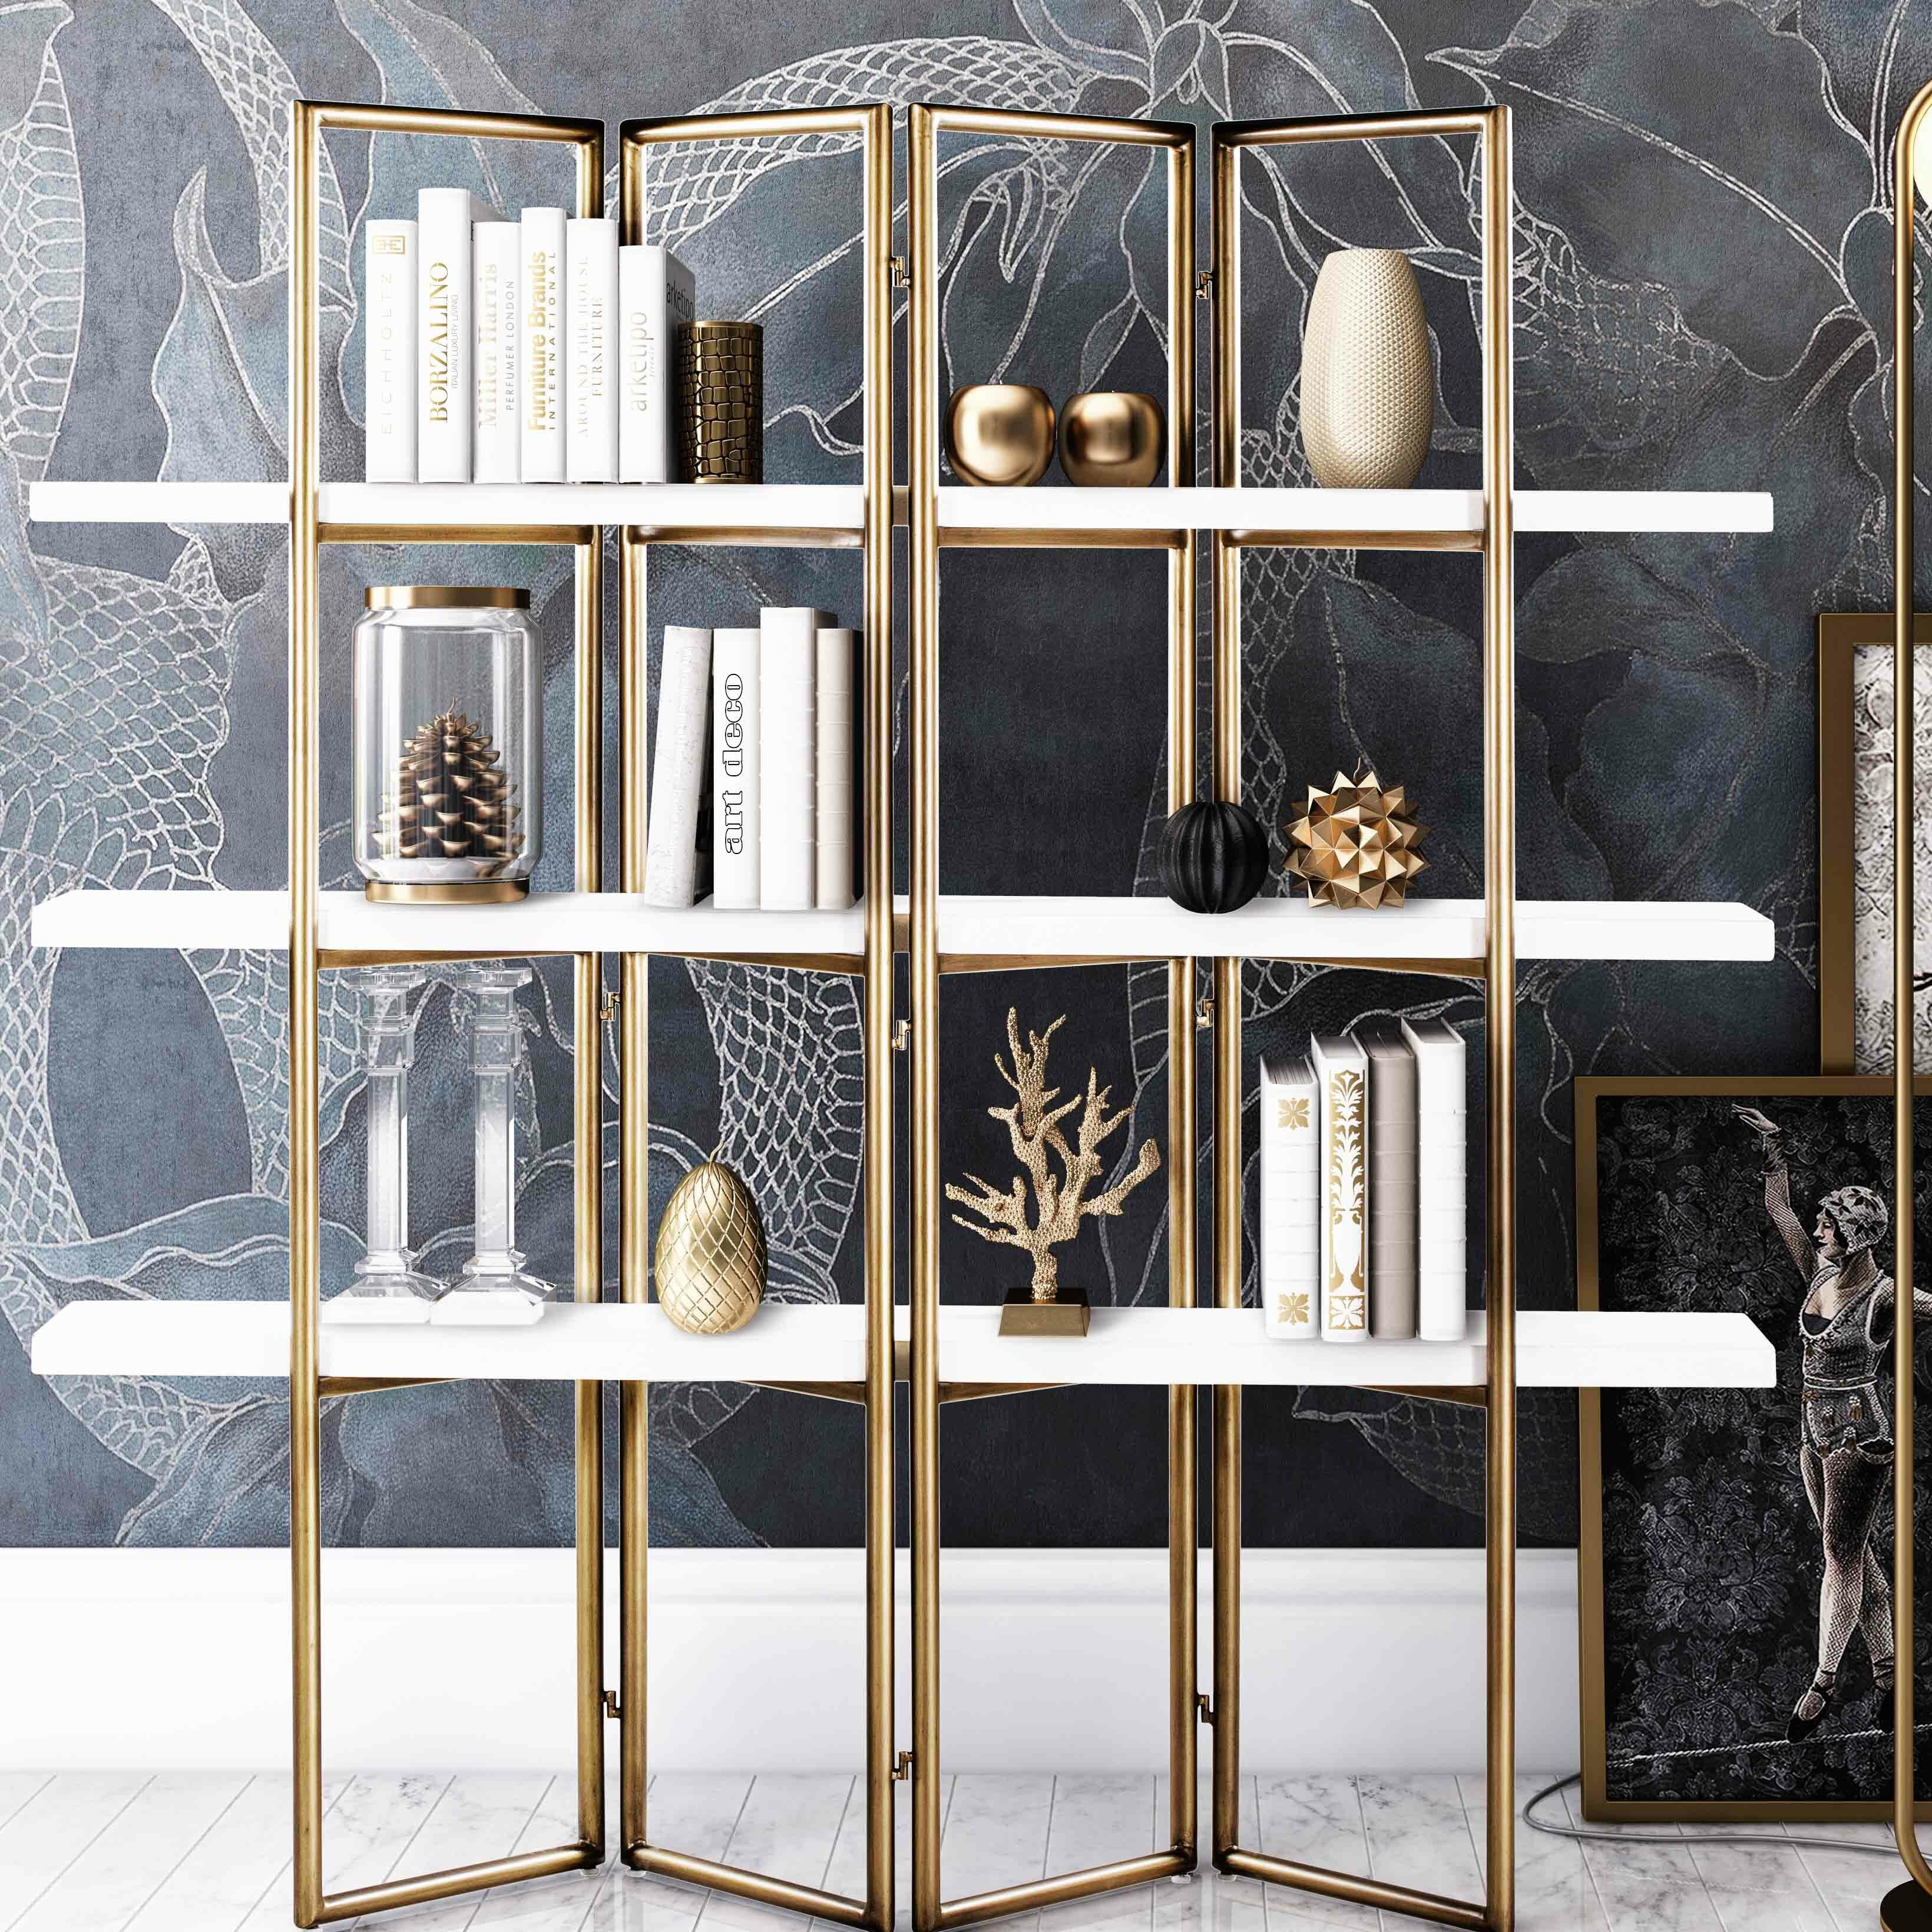 Ellenton Coffee Table With Storage: Everly Quinn Ellenton Concrete Etagere Bookcase